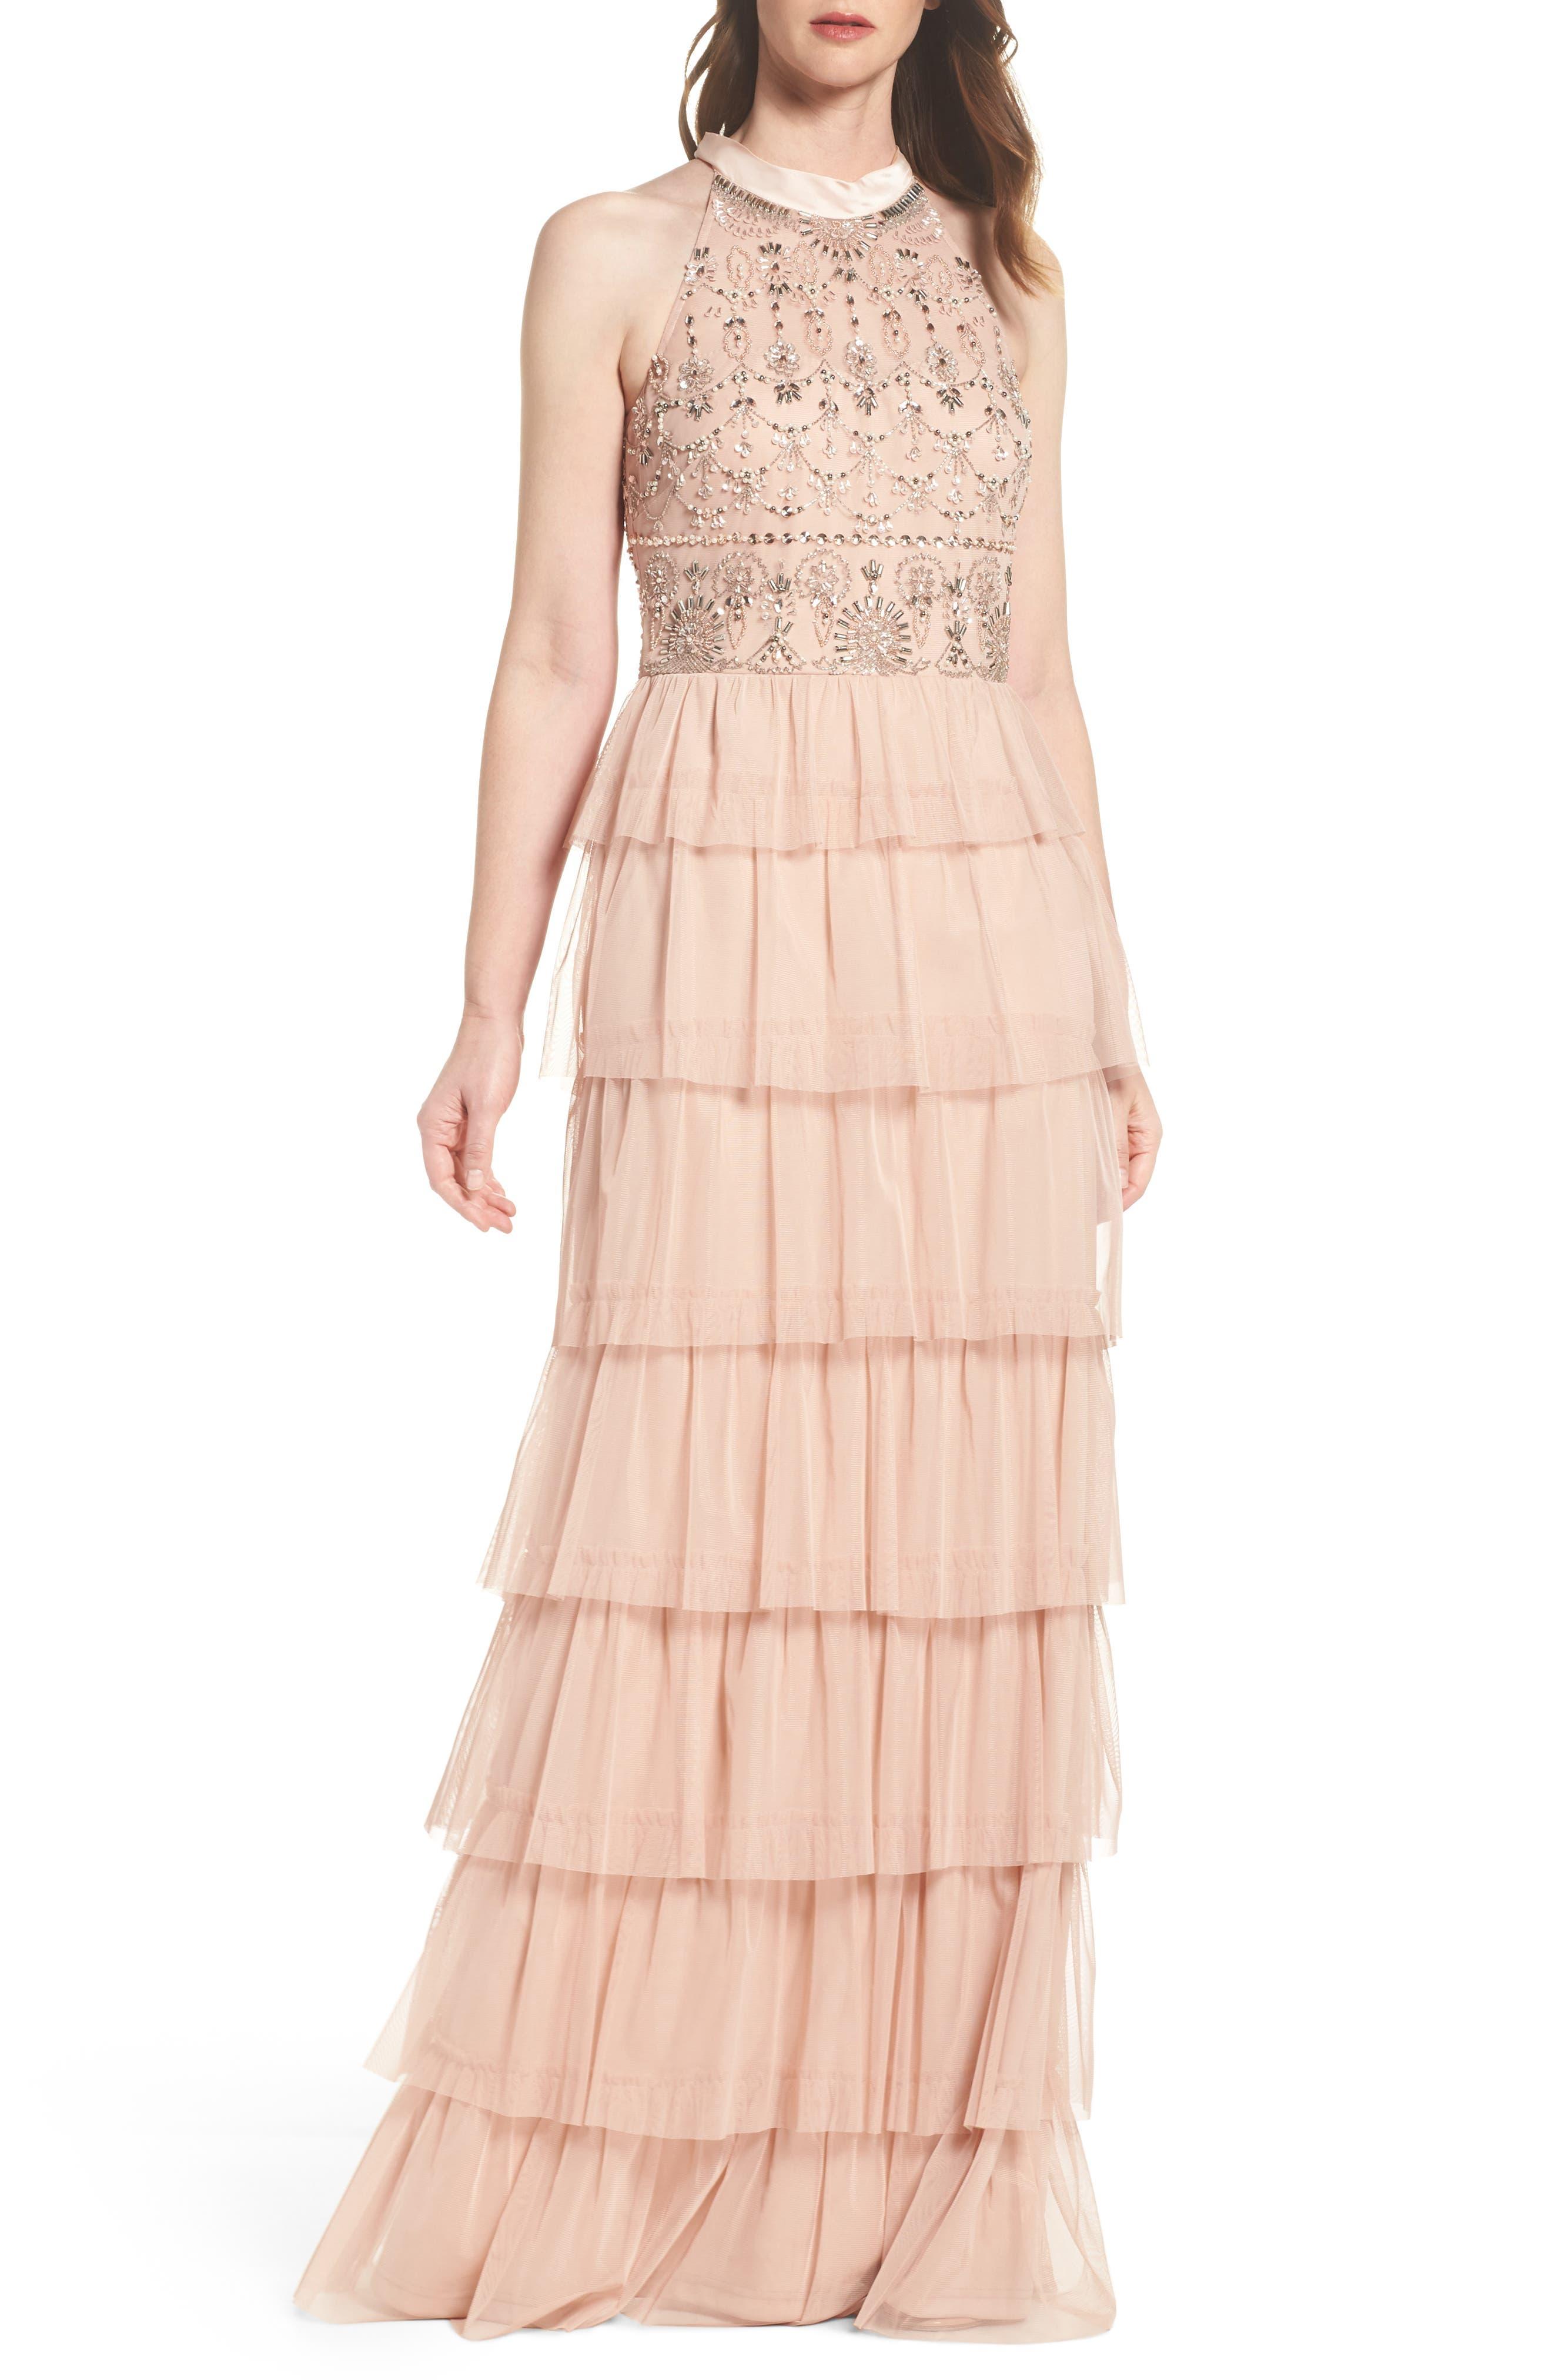 Embellished Tiered Maxi Dress,                             Main thumbnail 1, color,                             Blush